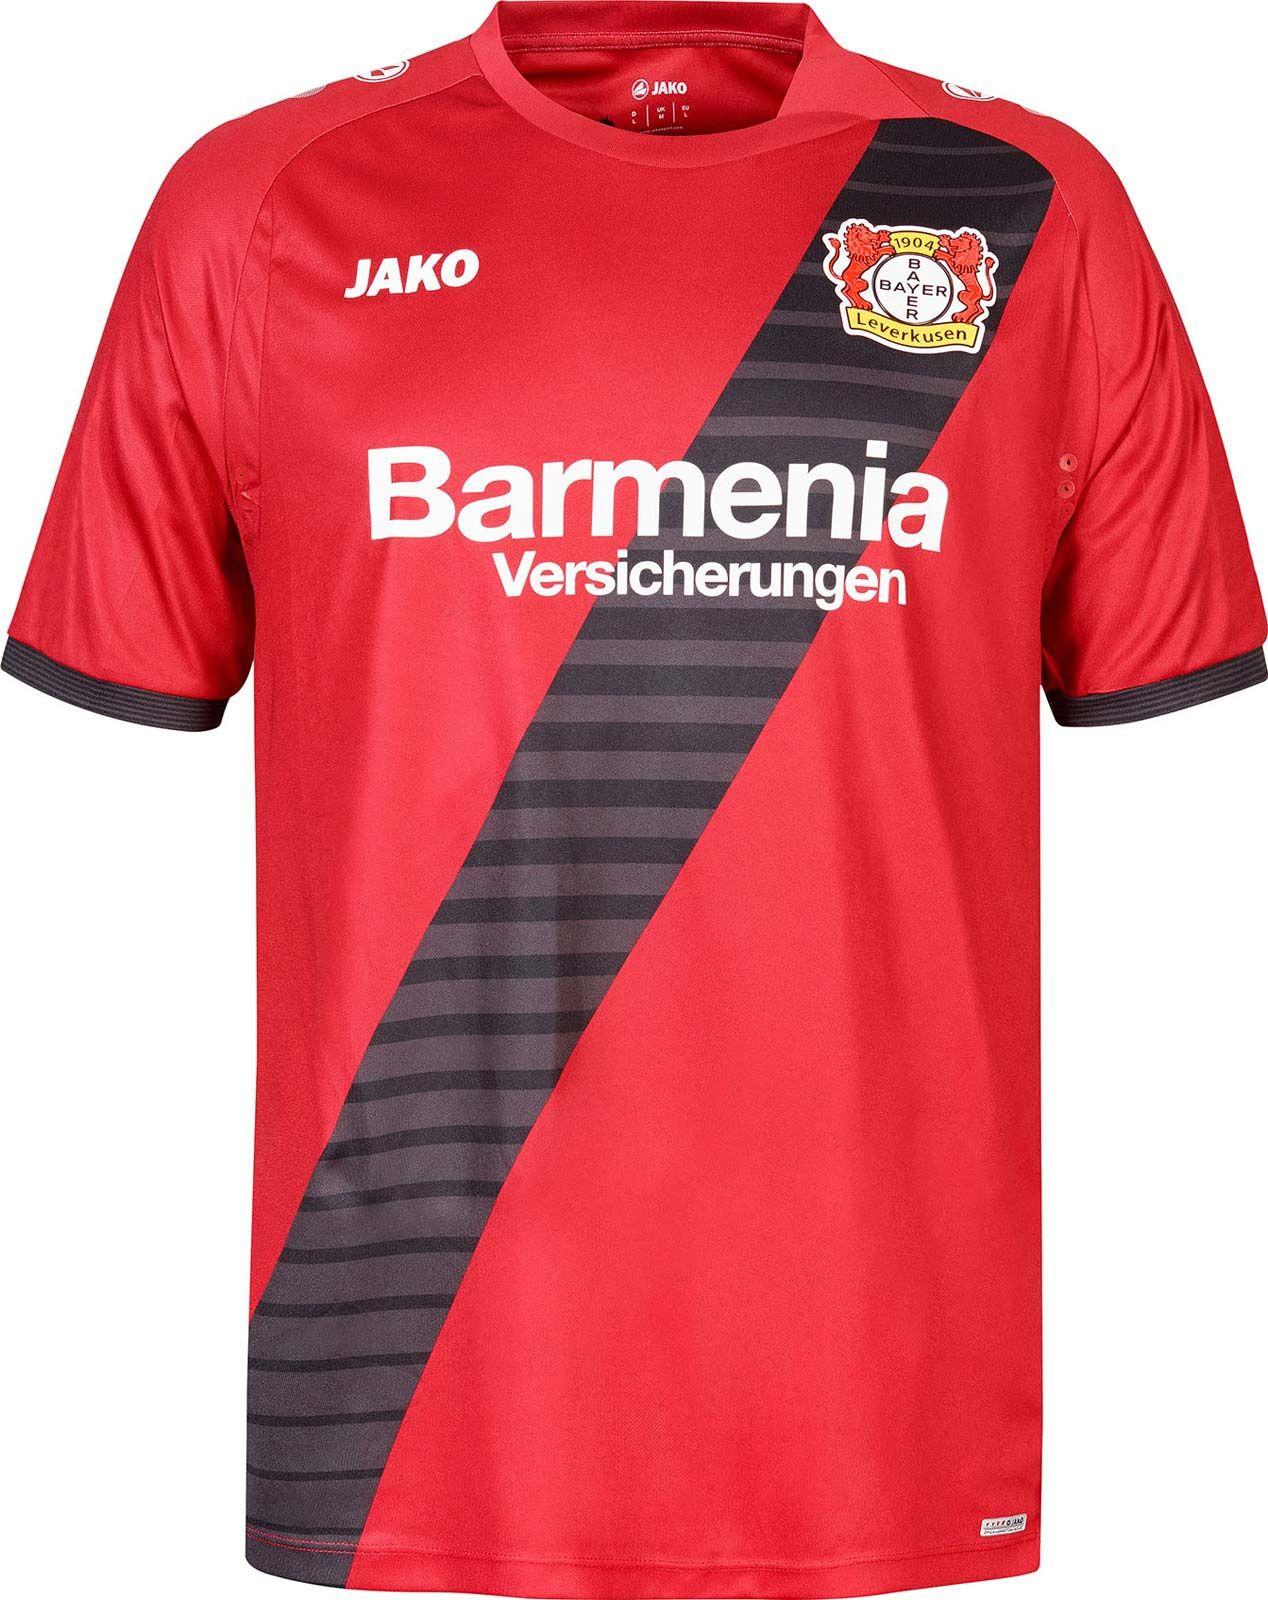 Bayer Leverkusen 16 17 Away Kit Released Soccer Shirts Soccer Jersey Football Shirts